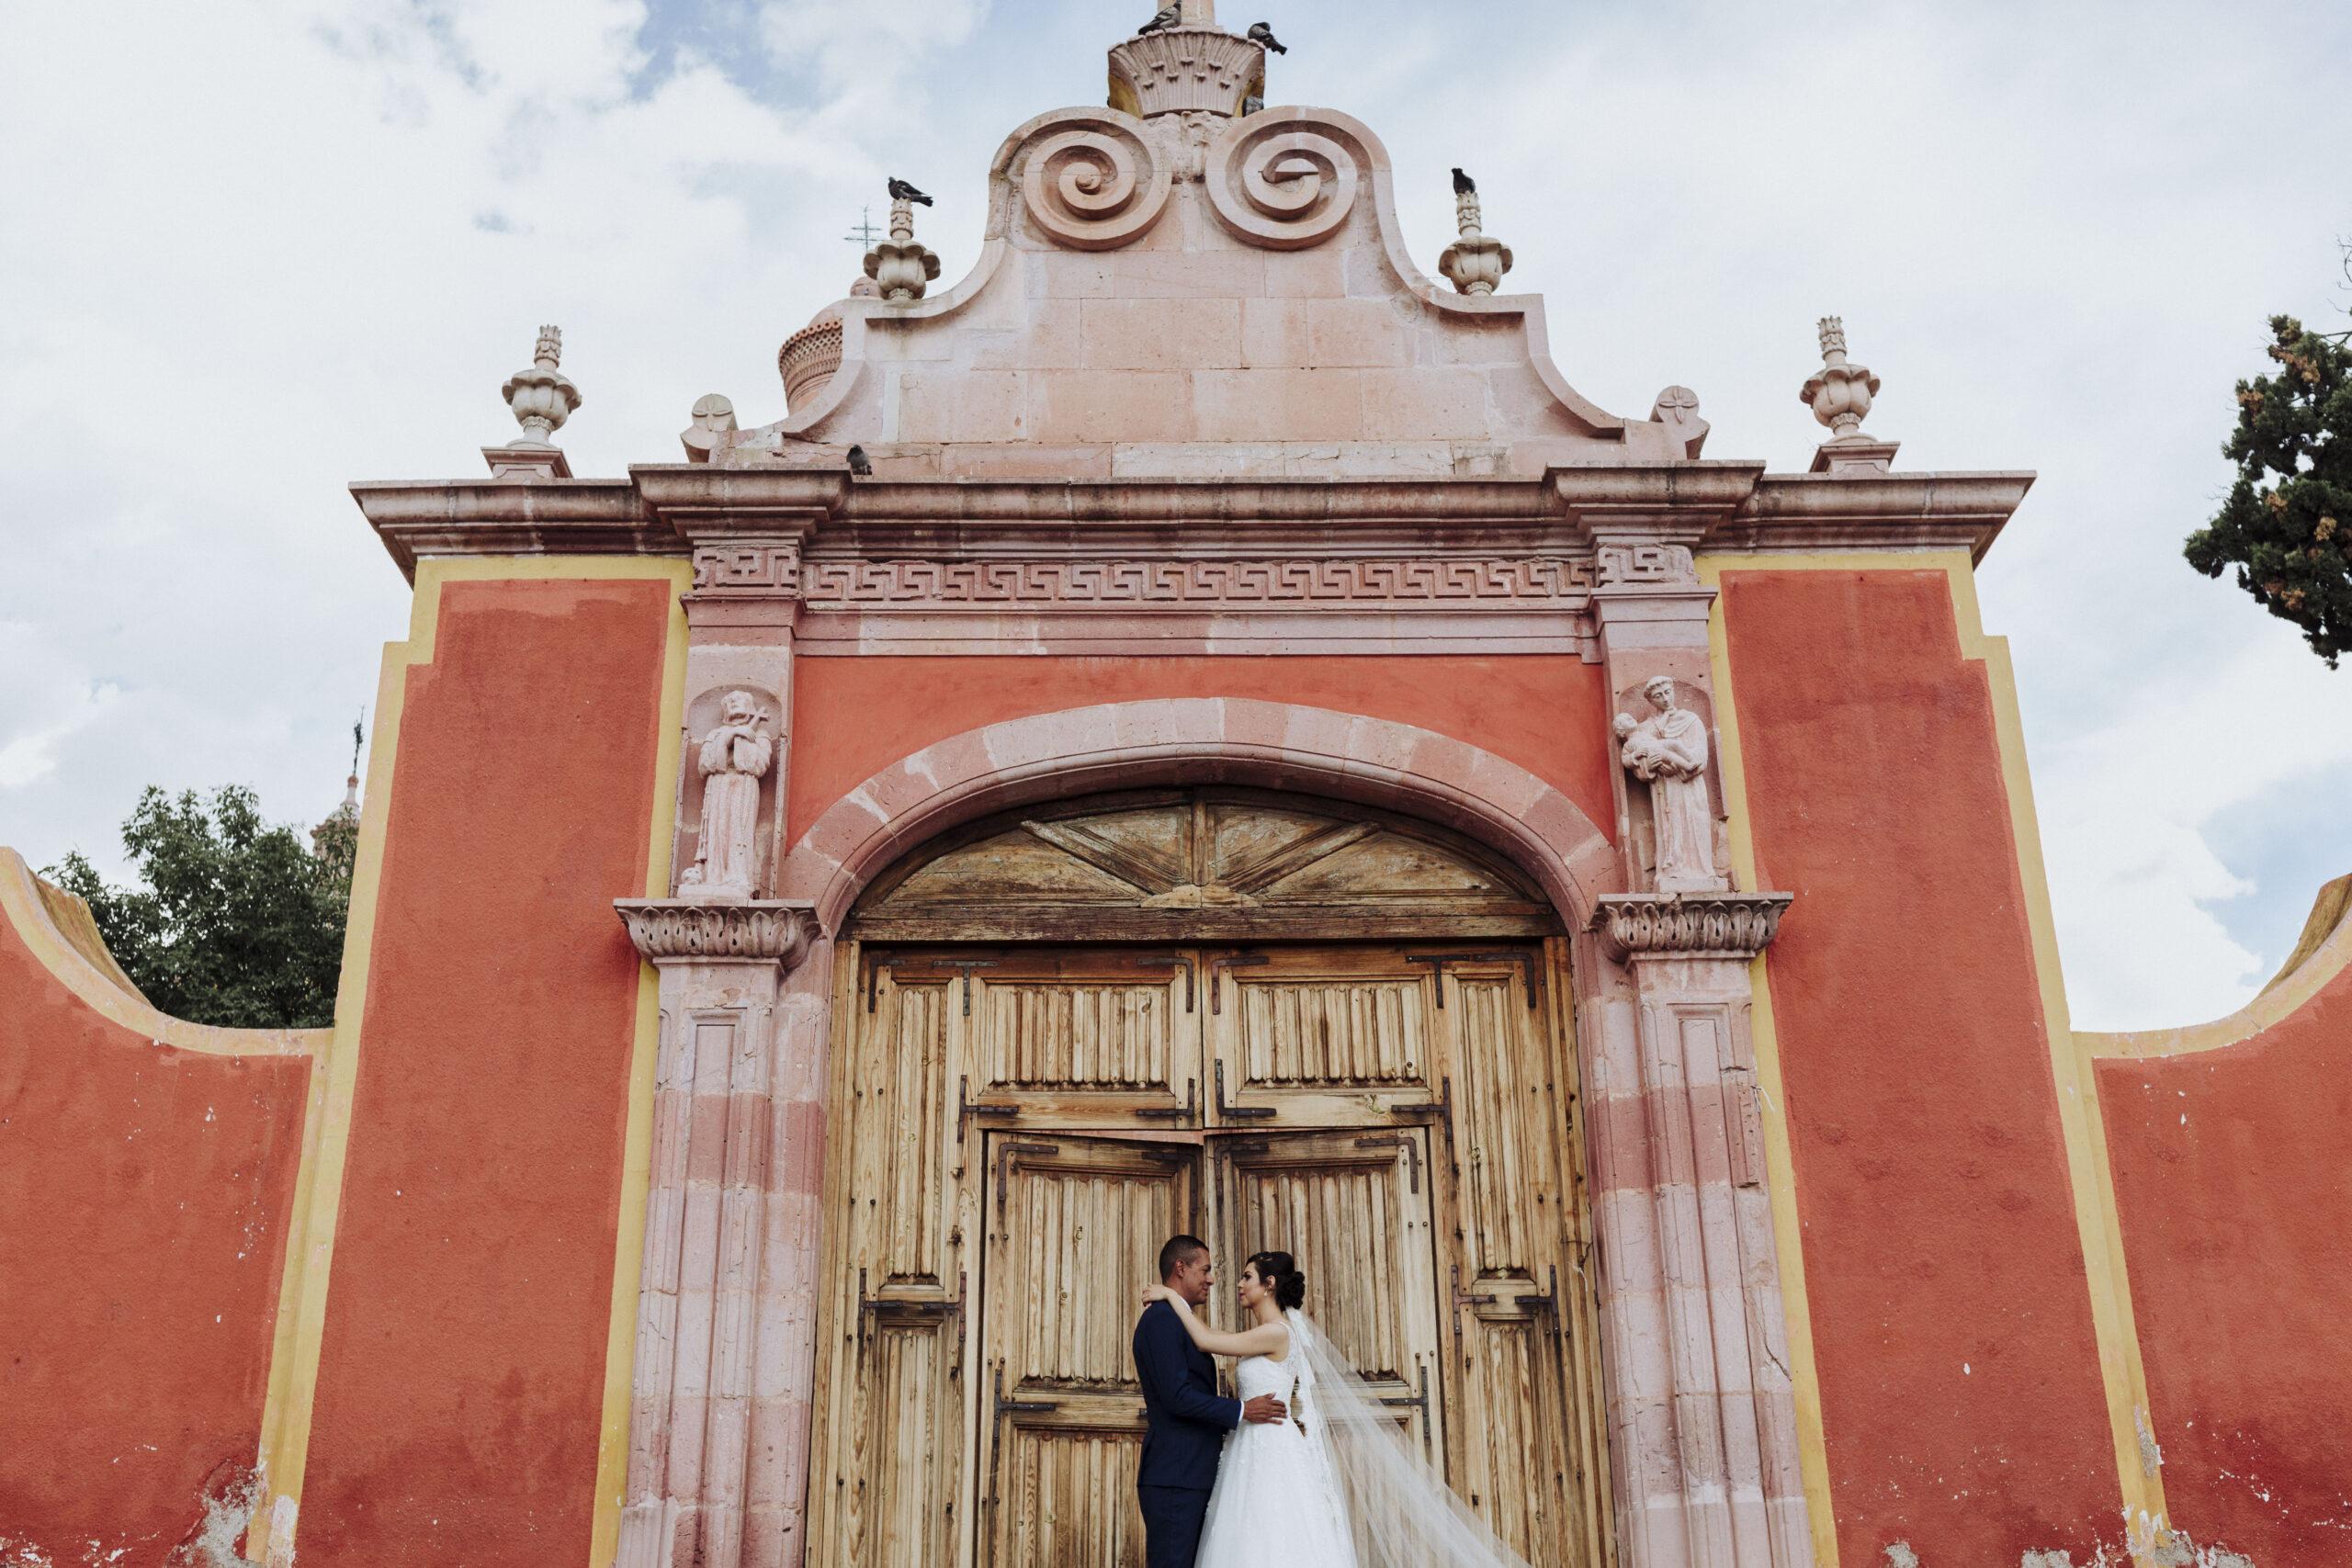 javier_noriega_fotografo_profesional_zacatecas_mexico_chihuahua_photographer25